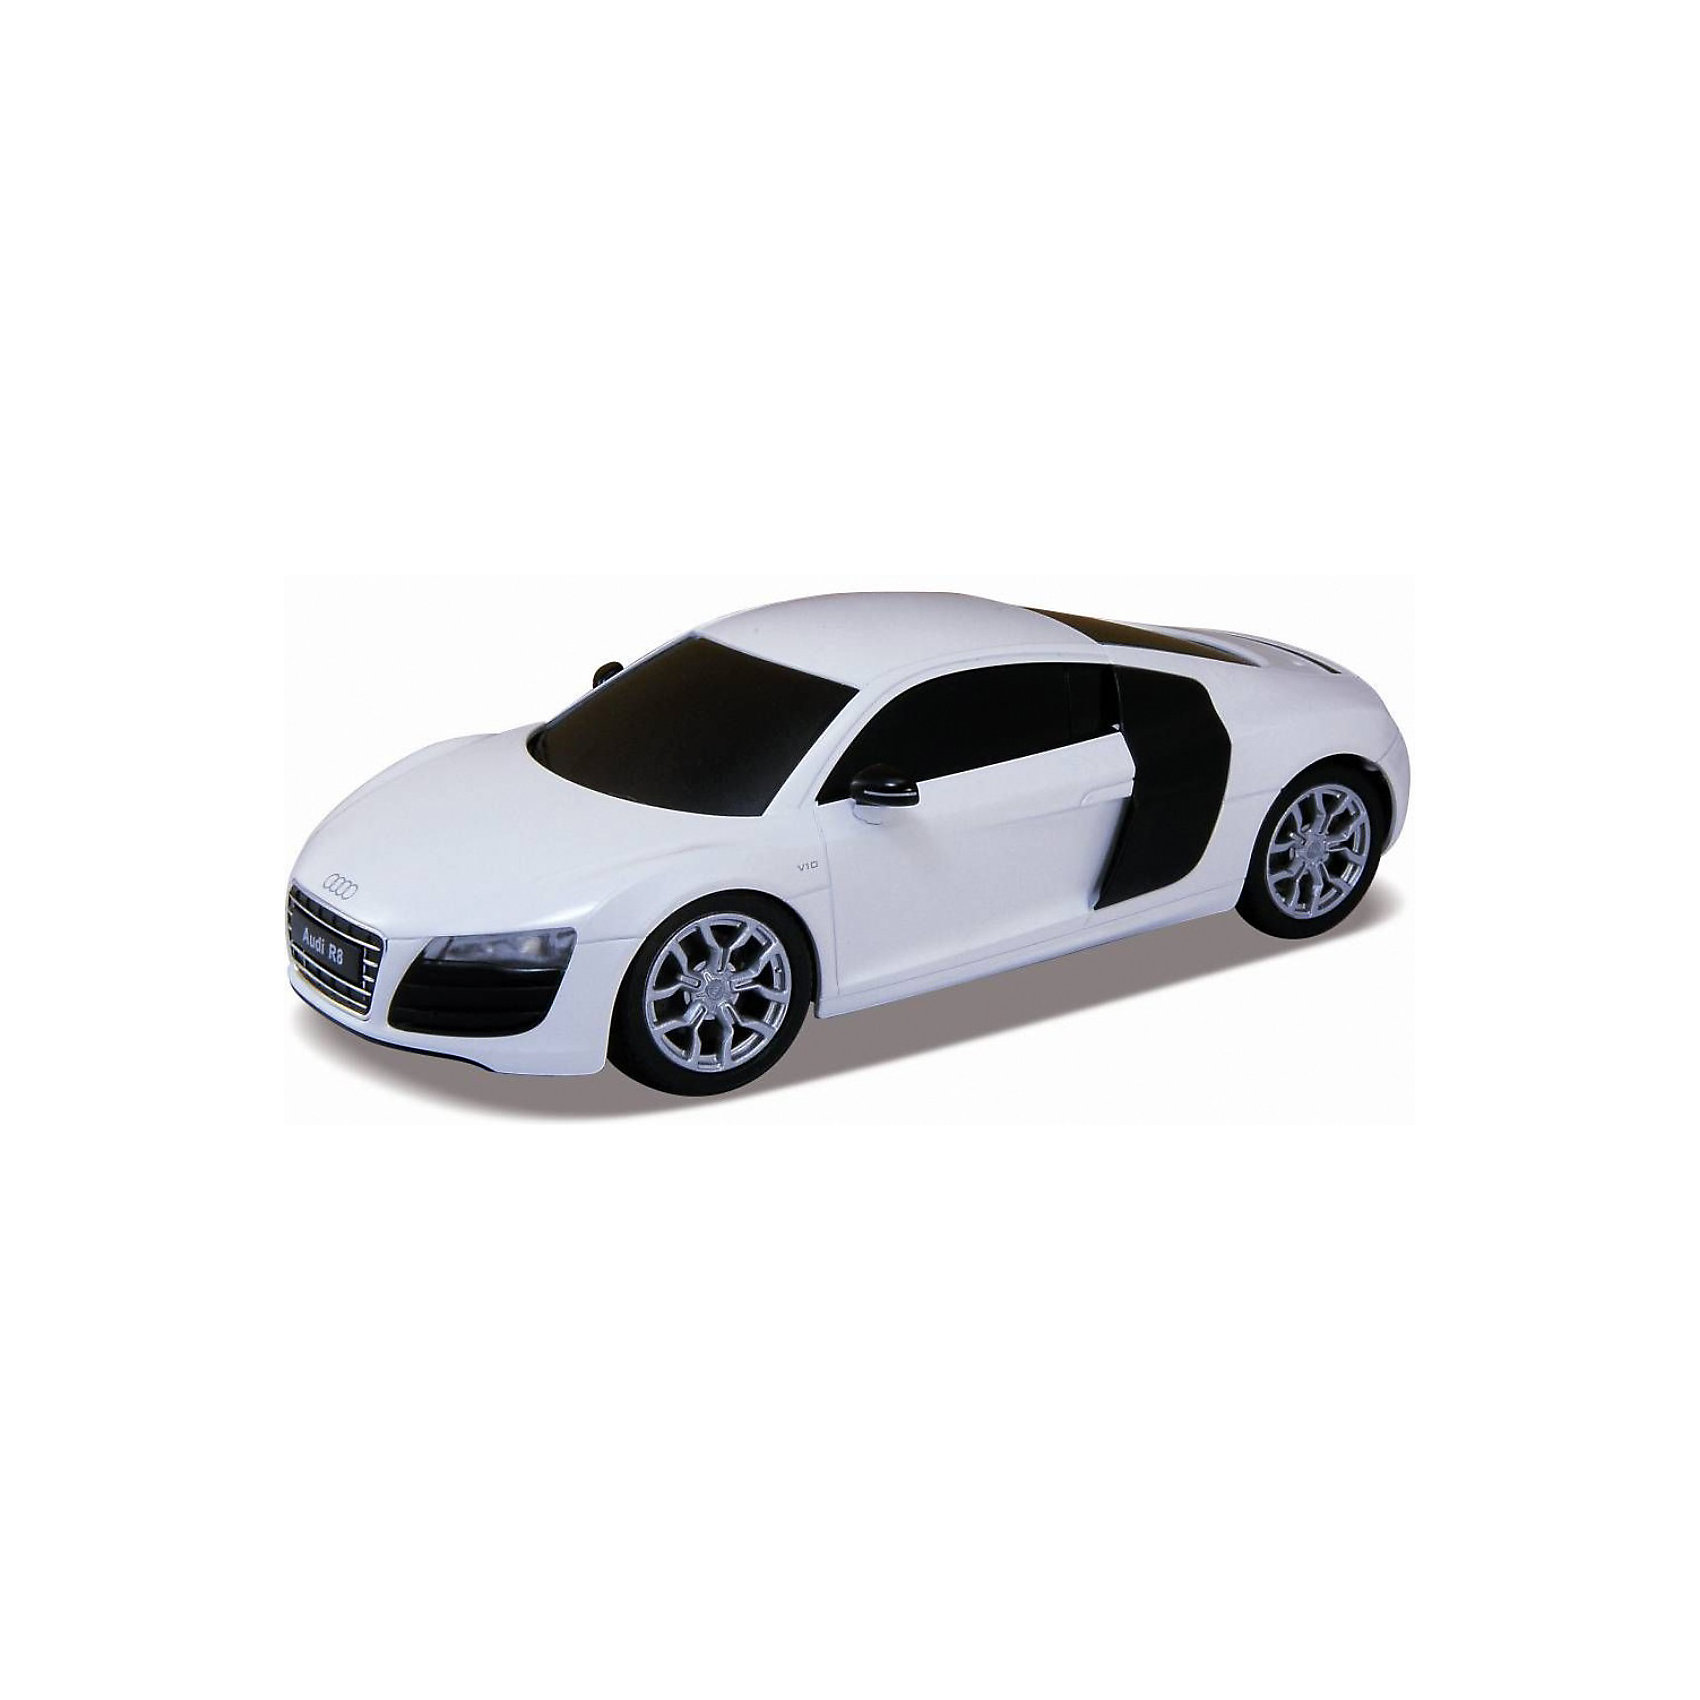 Модель машины 1:24 Audi R8 V10, р/у, Welly